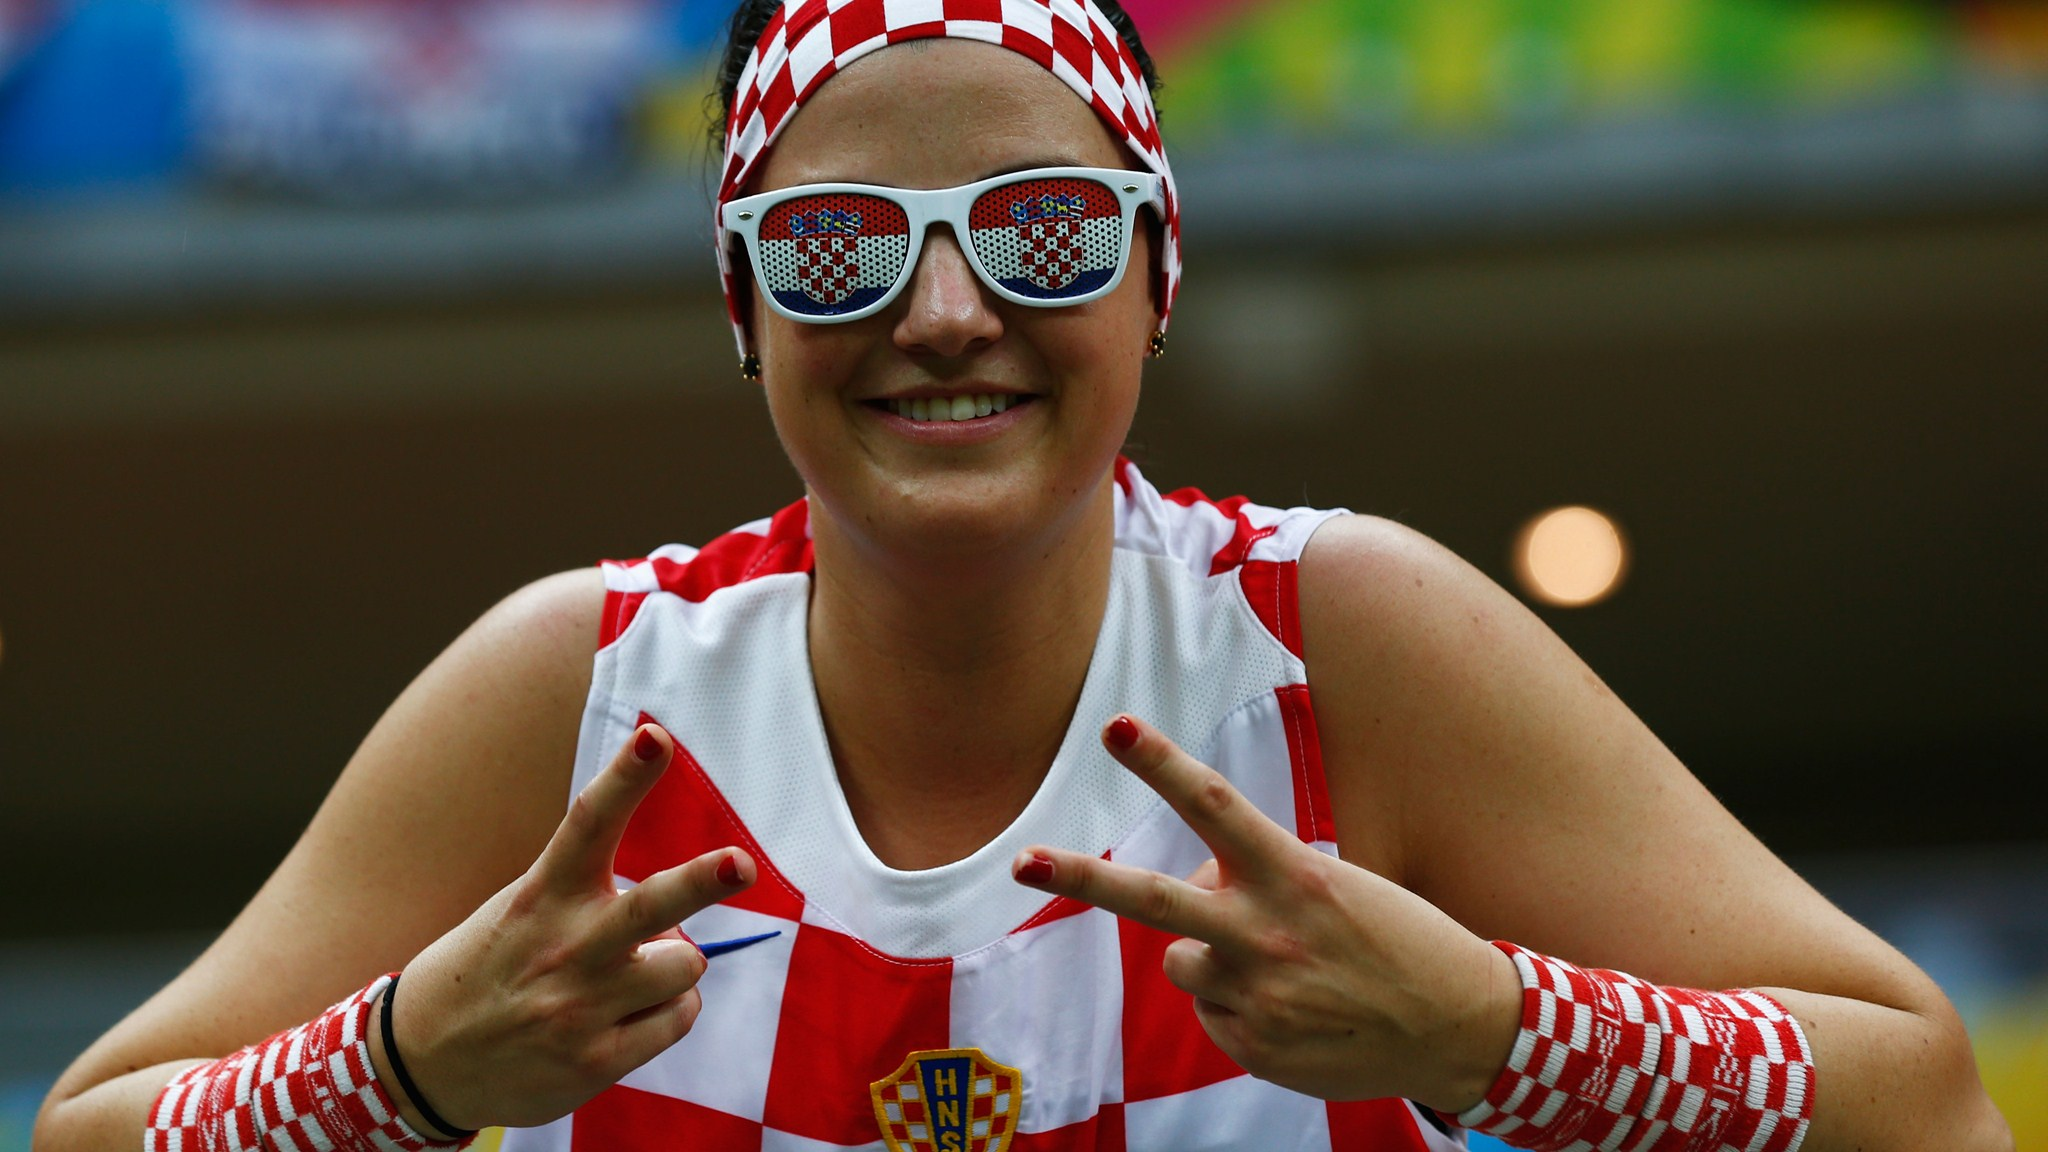 102 - Cameroon-Croatia [0-4] -- 18 Jun 2014 - 18-00 -- manaus_arena_amazonia